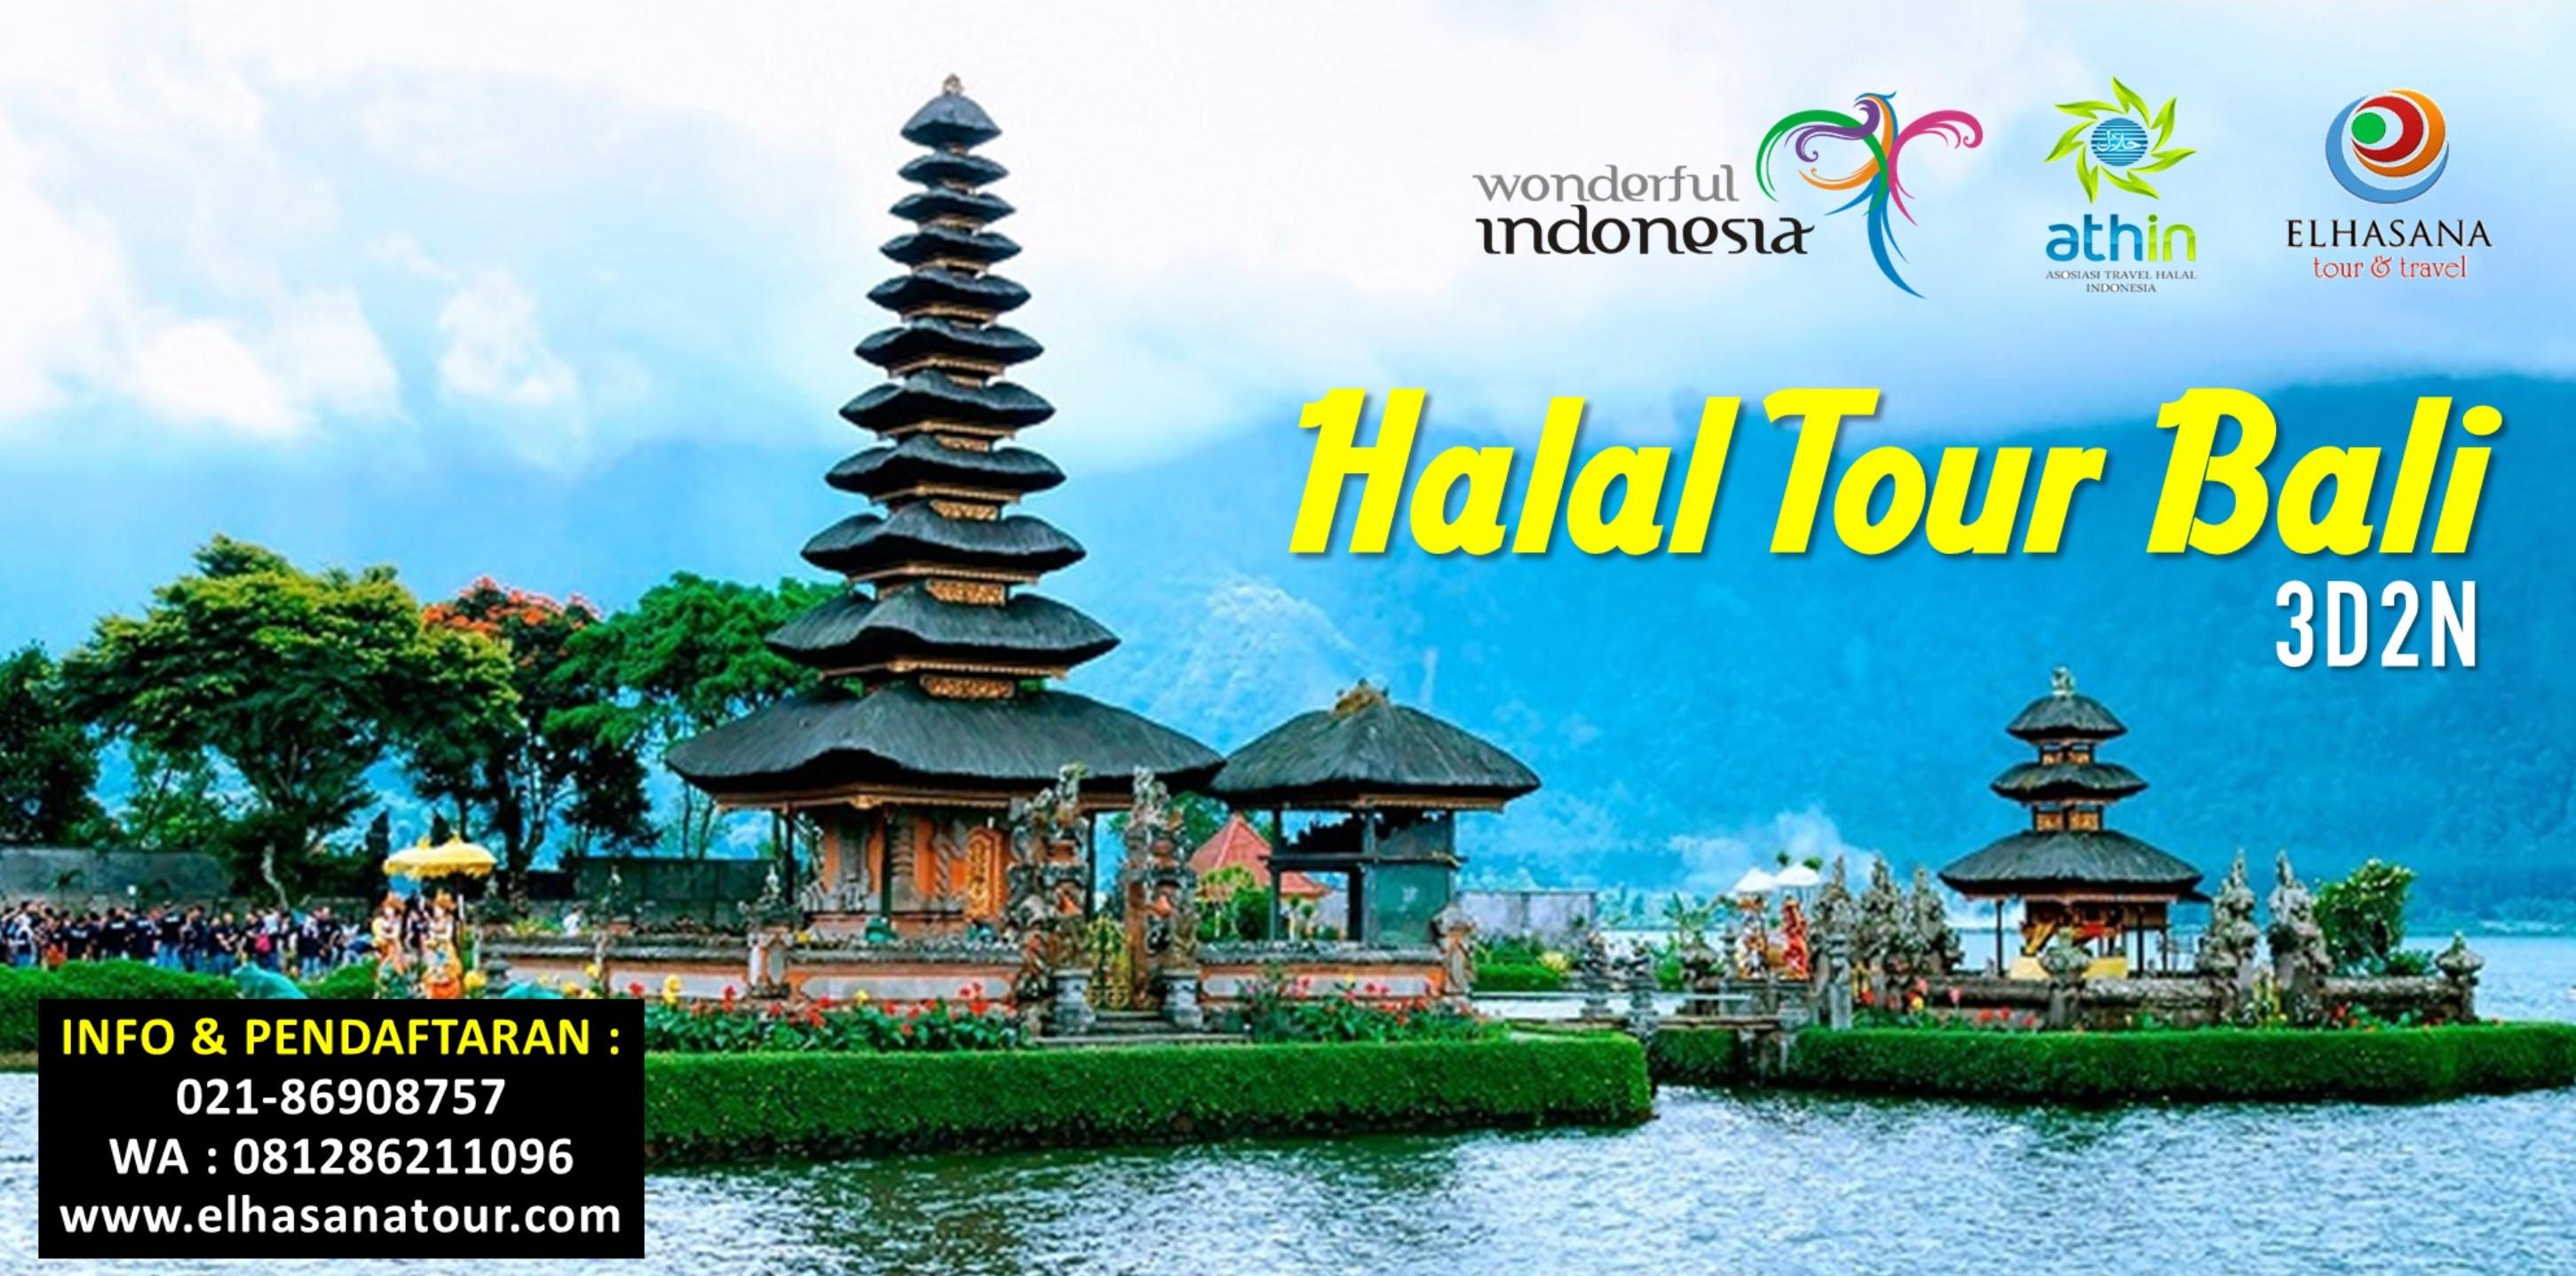 Halal Tour Bali 3d2n Elhasana Tour